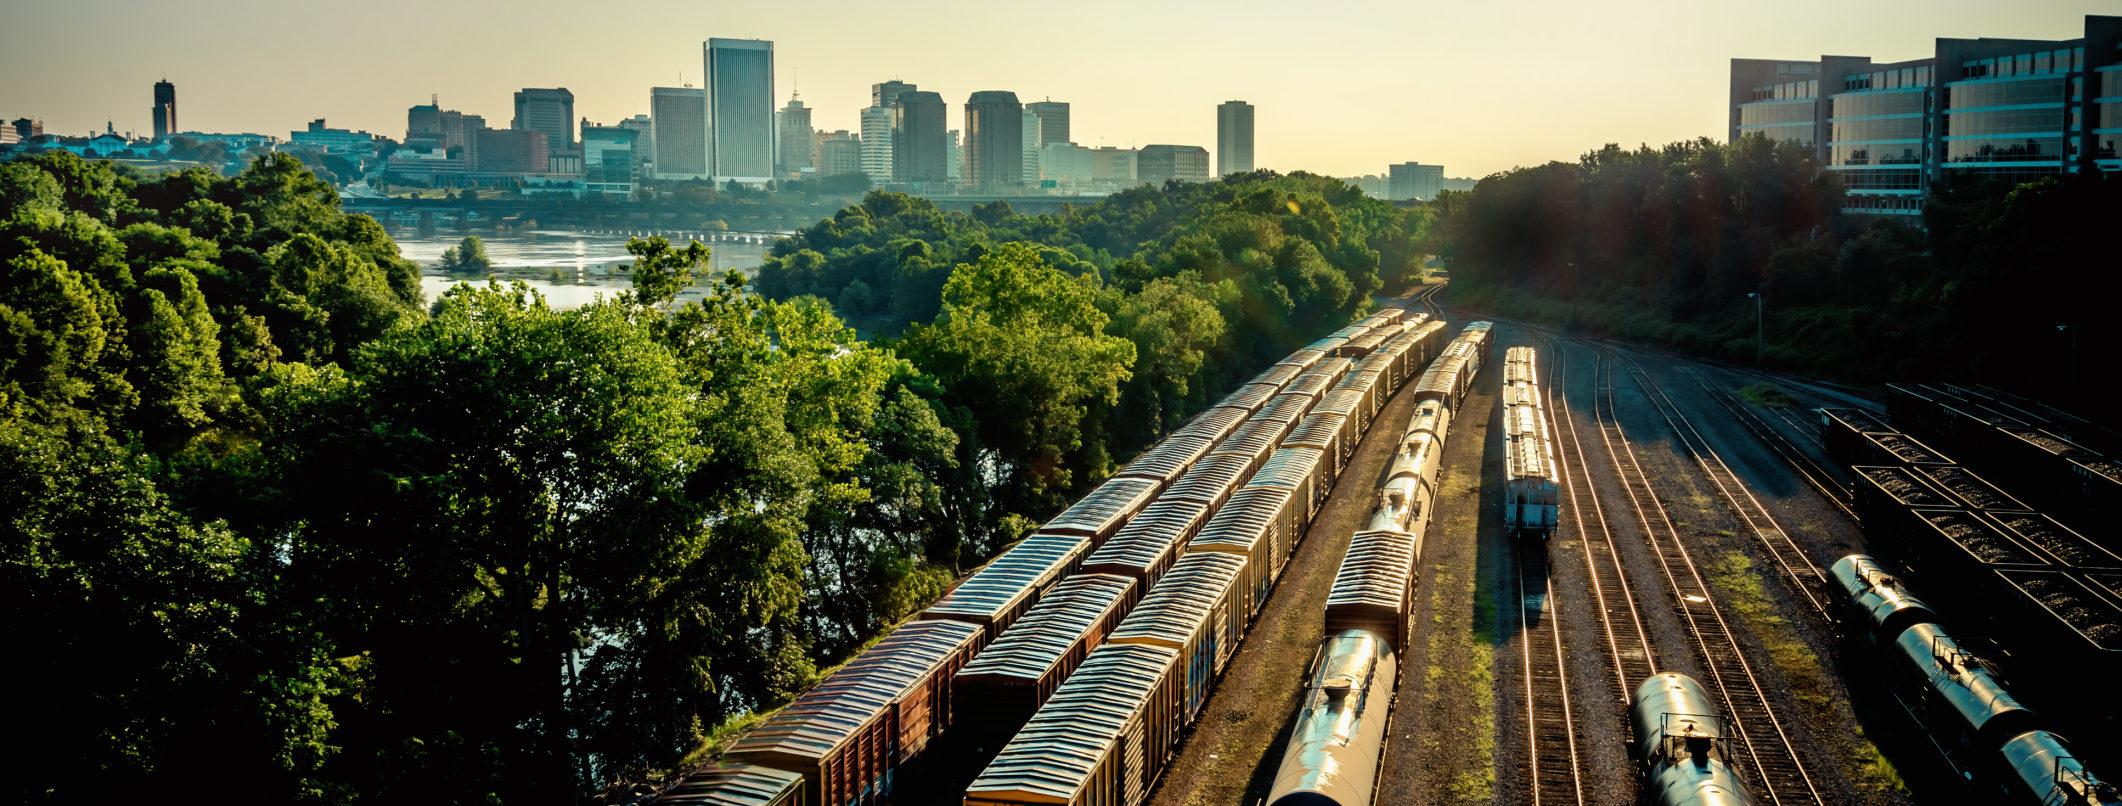 The Association Of American Railroads